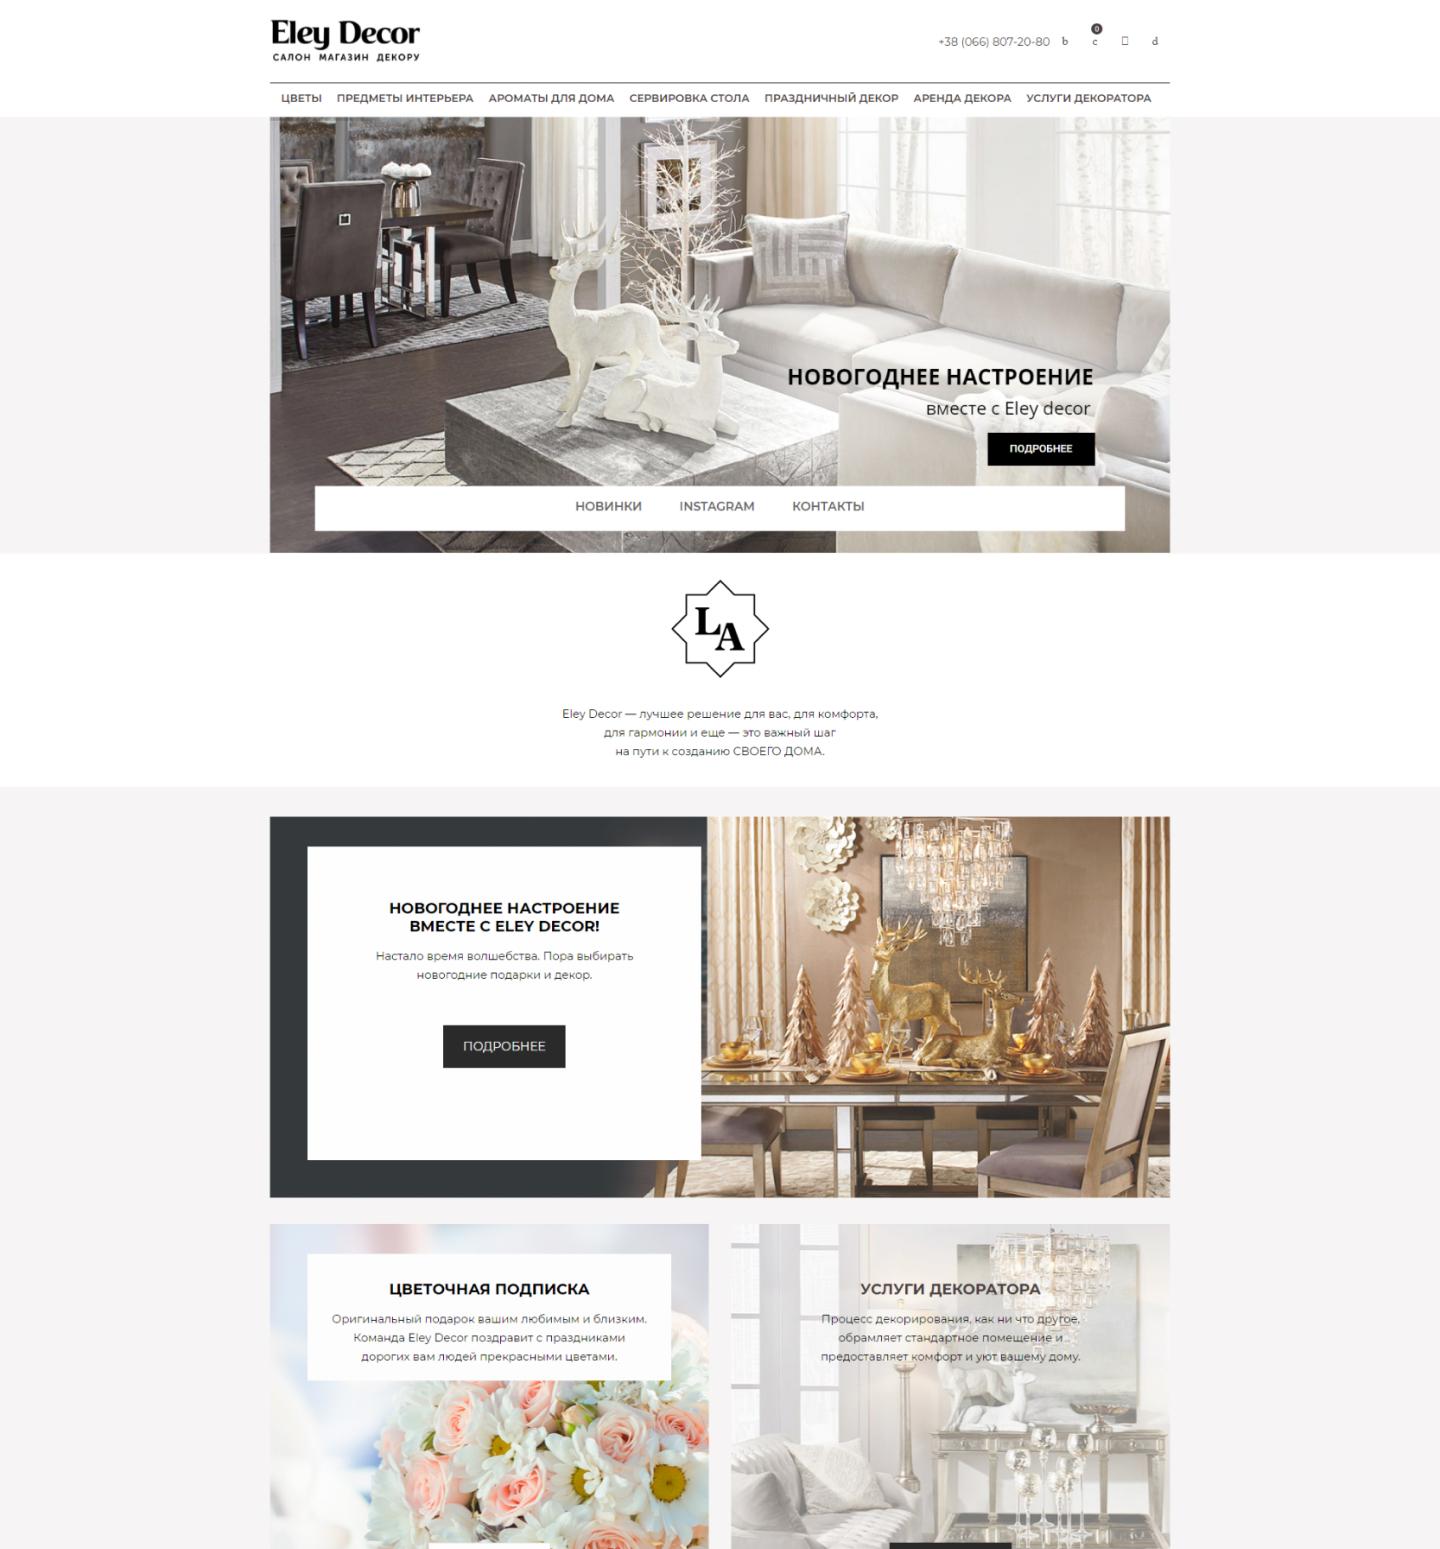 Интернет магазин декора - Eleydecor